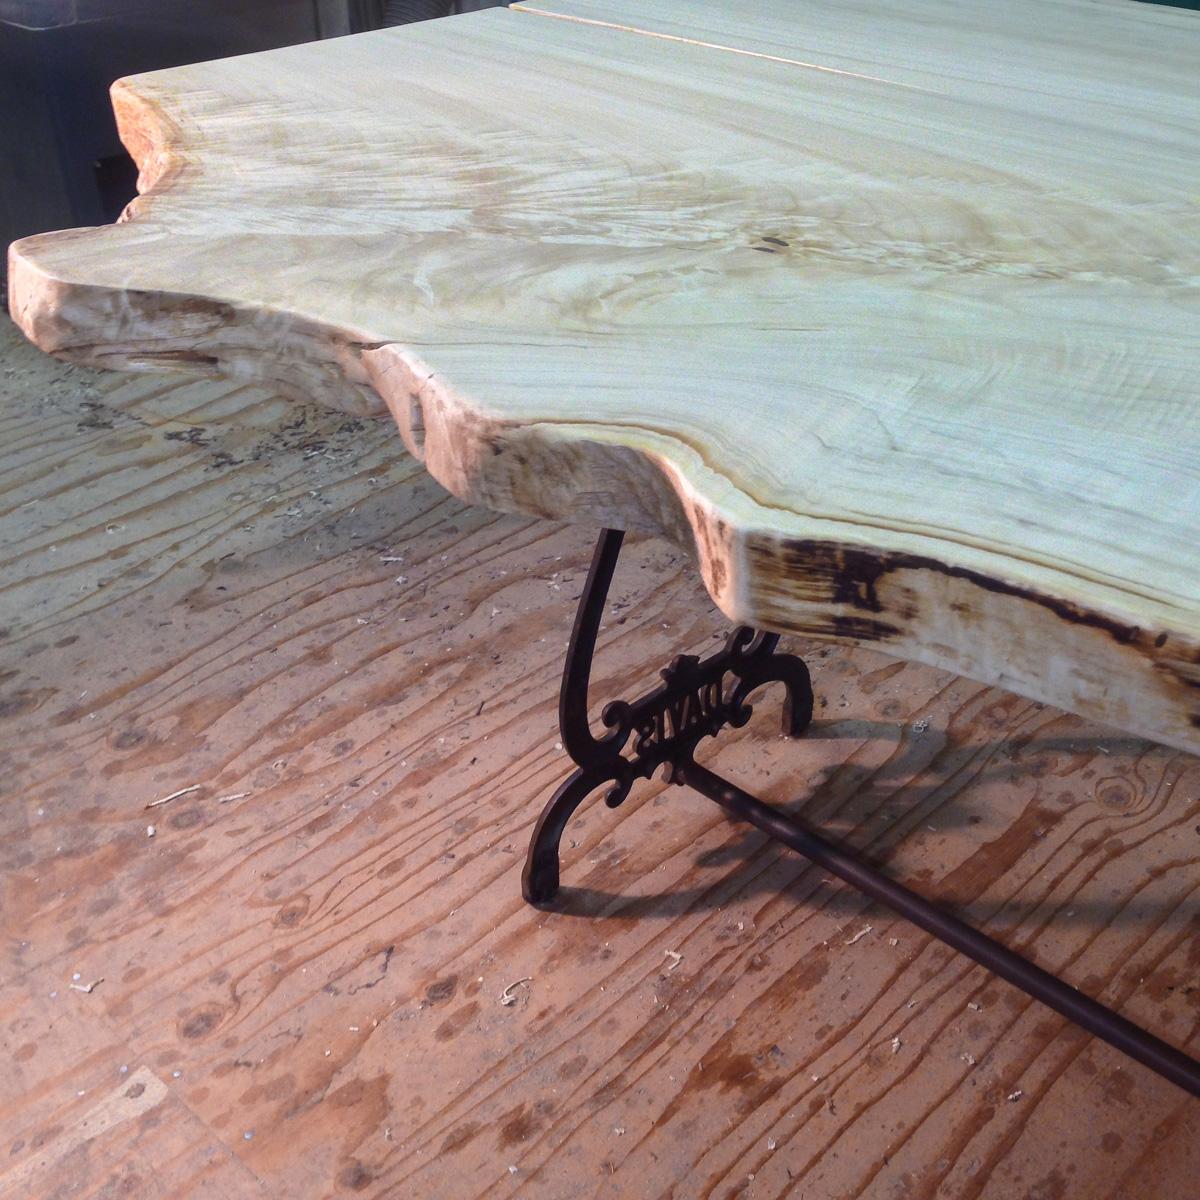 Live edge cottonwood slab on a reclaimed Singer sewing machine base.